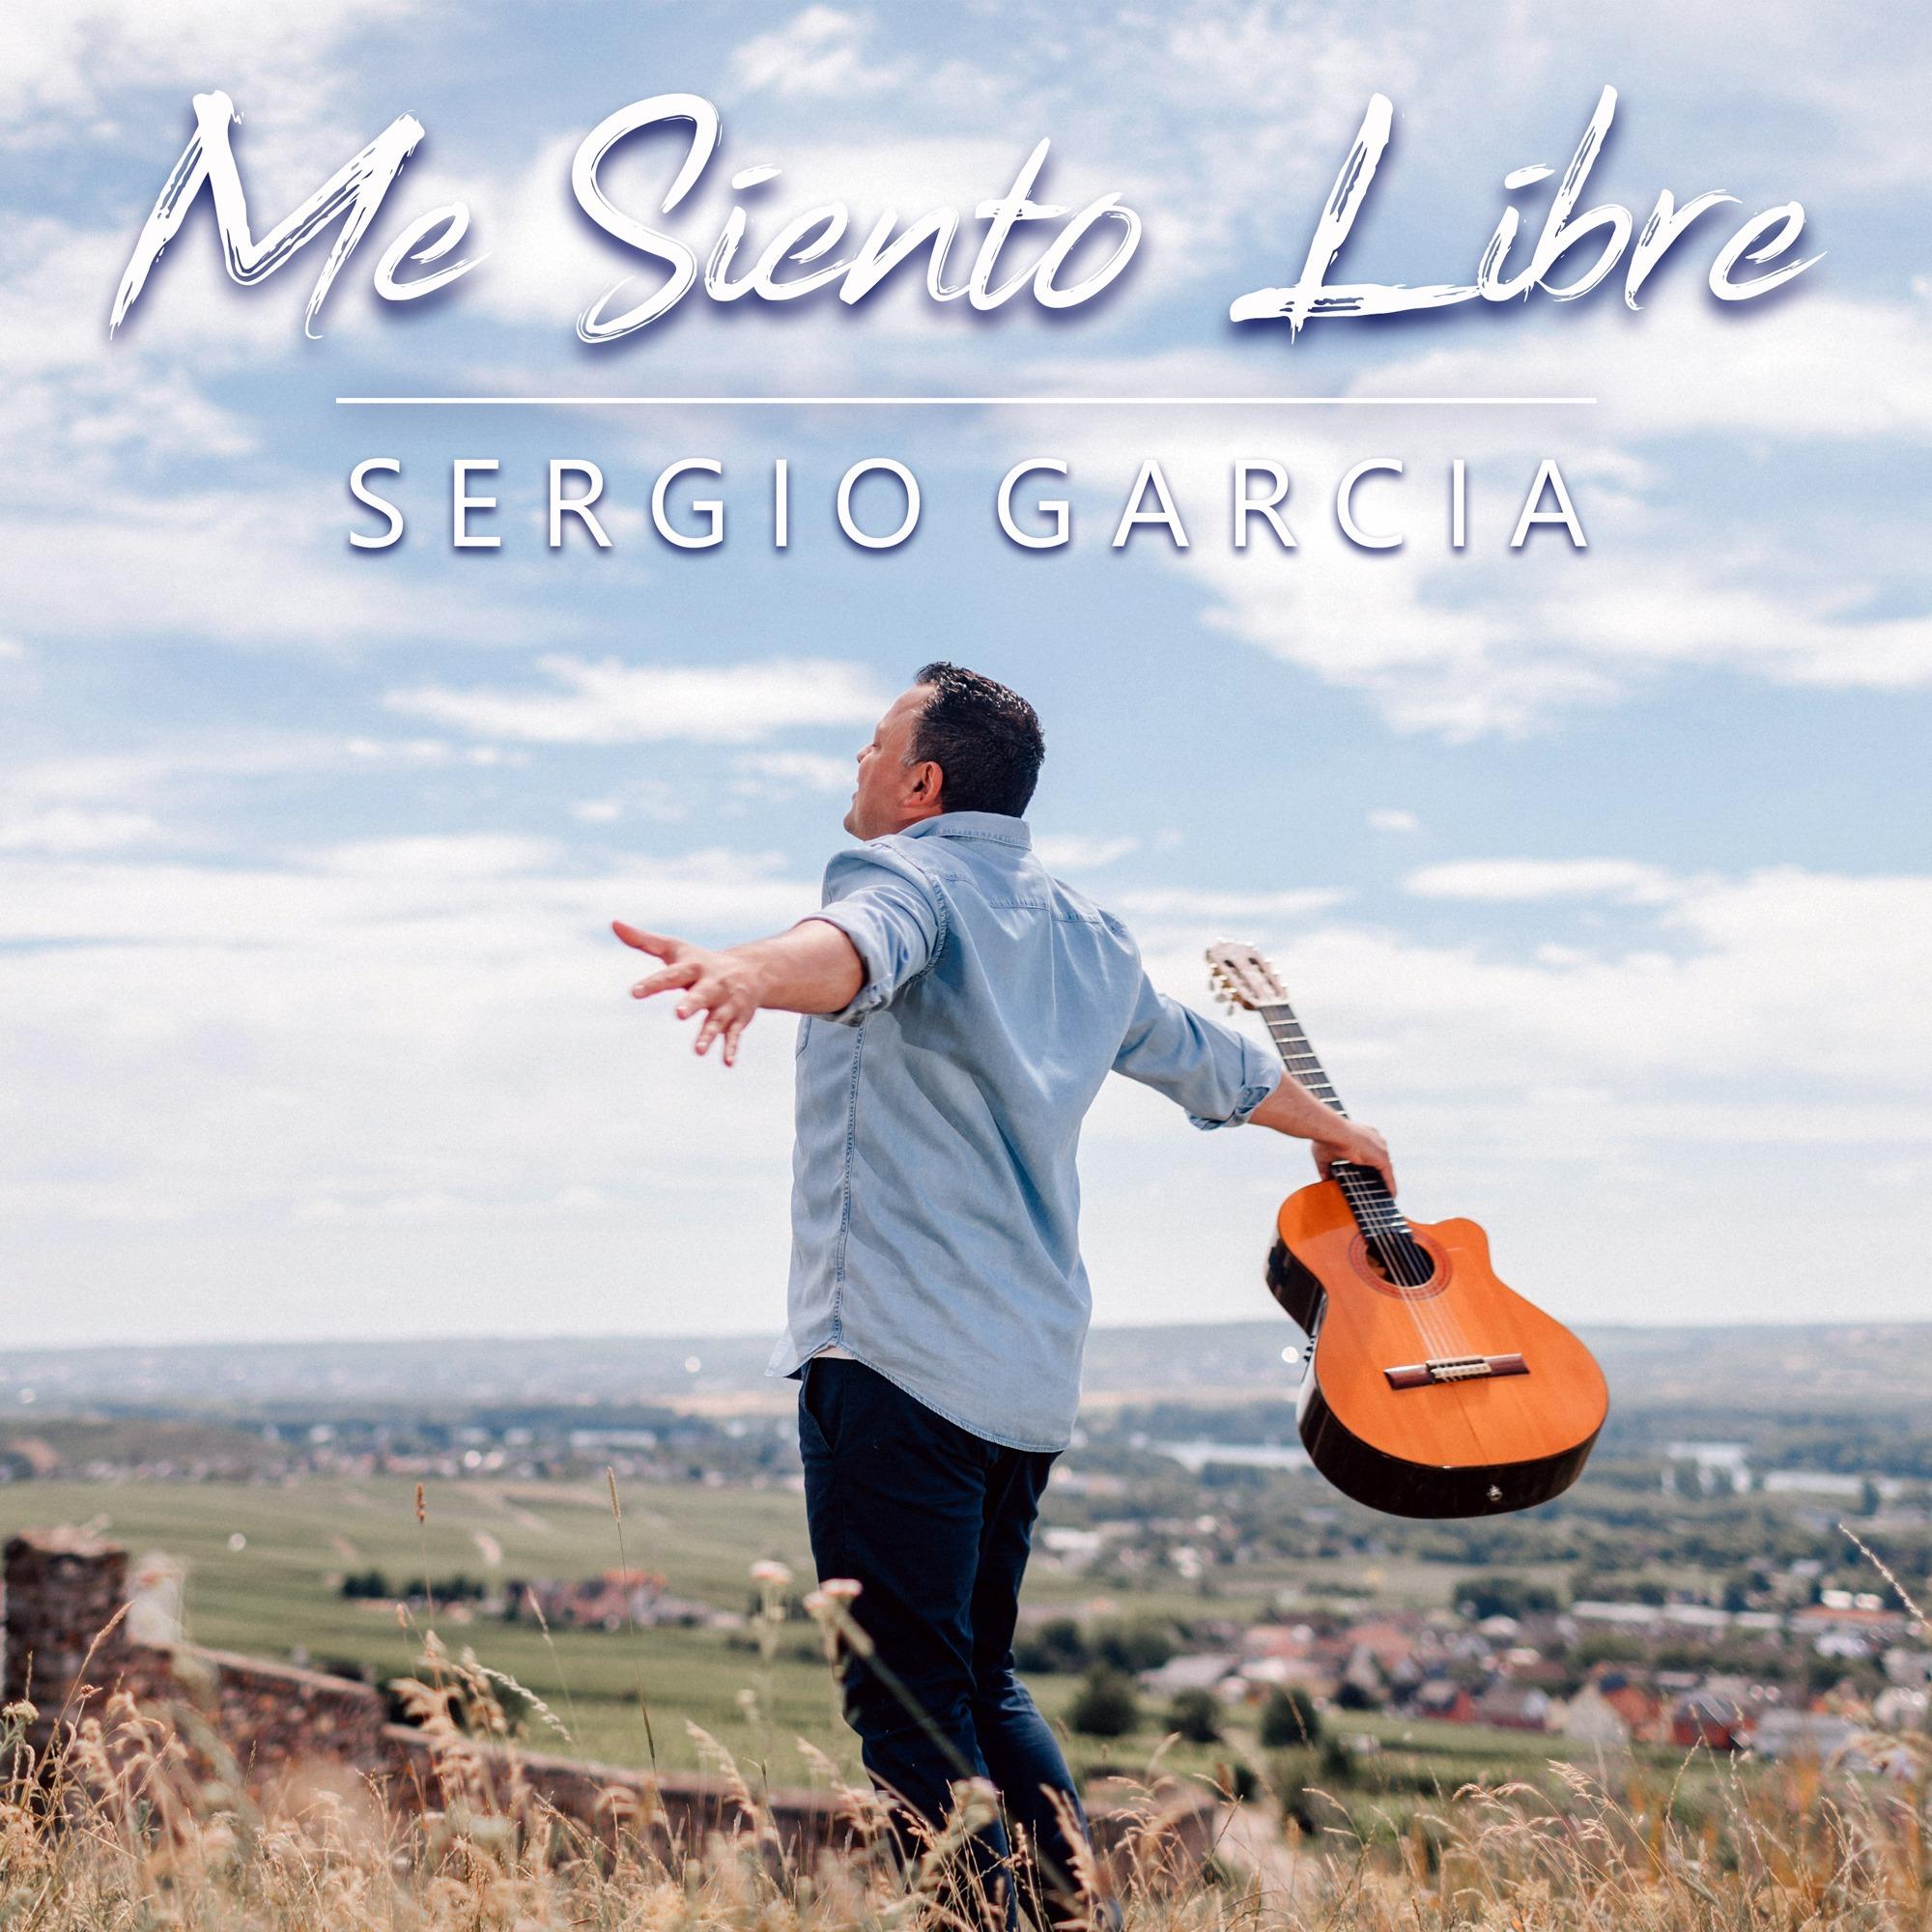 ME SIENTO LIBRE (SergioGarcia_music) Profile Image | Linktree